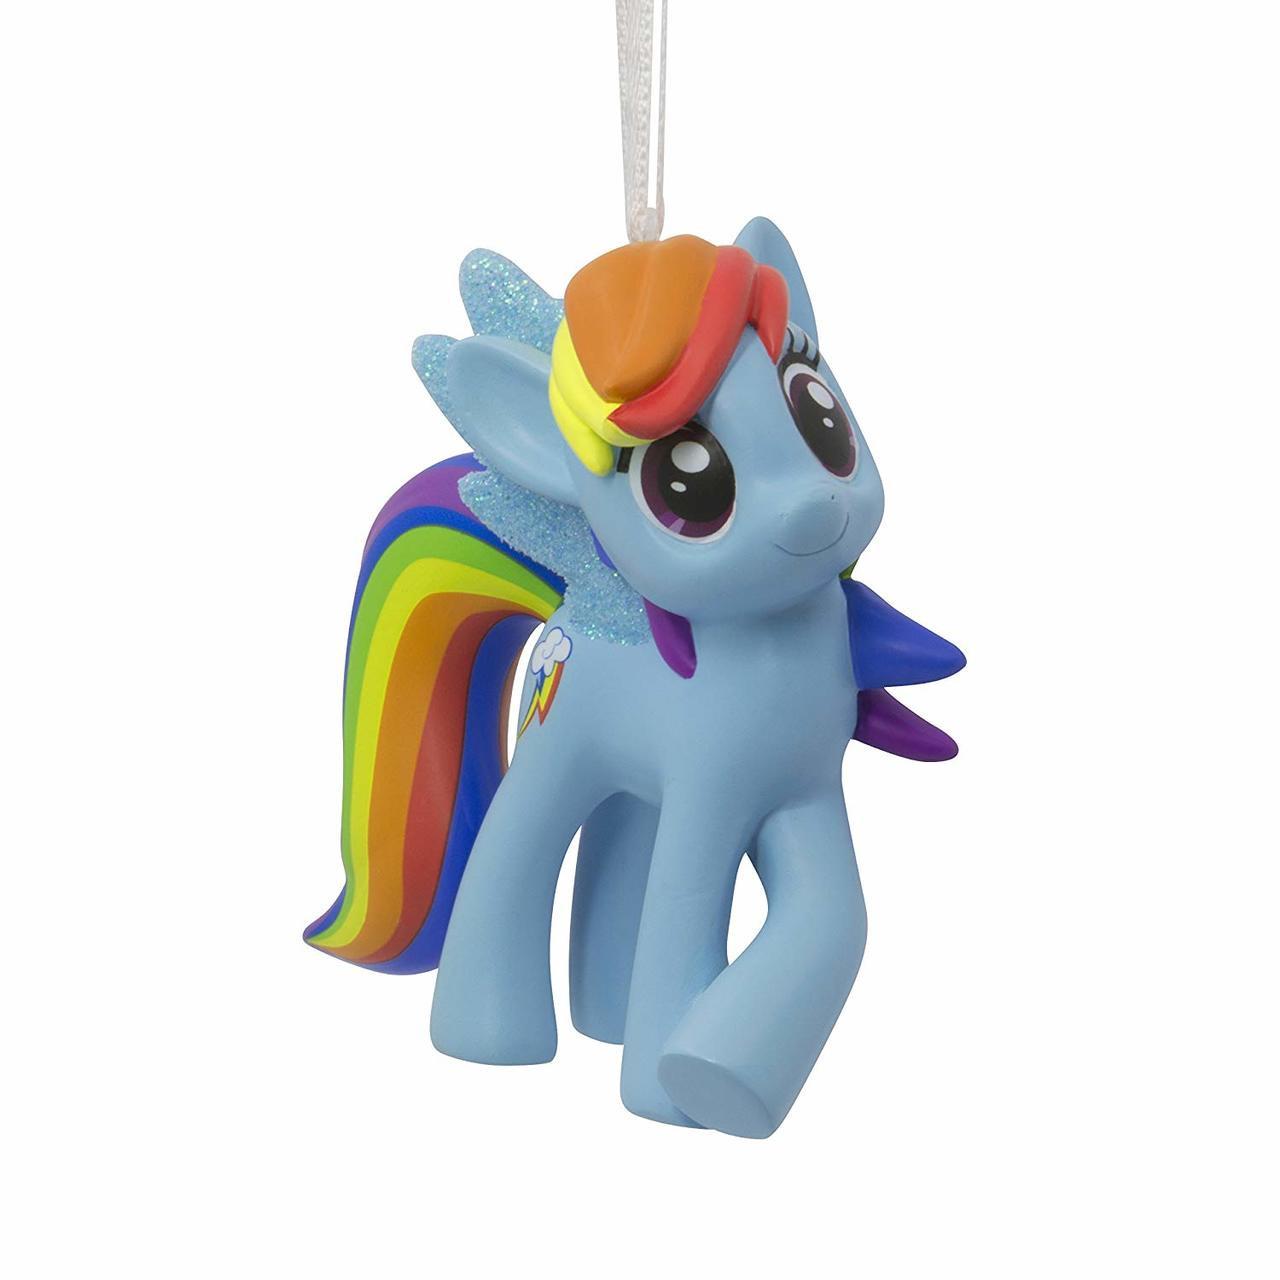 Hallmark Christmas Ornaments.Hallmark Hasbro My Little Pony Rainbow Dash Ornament